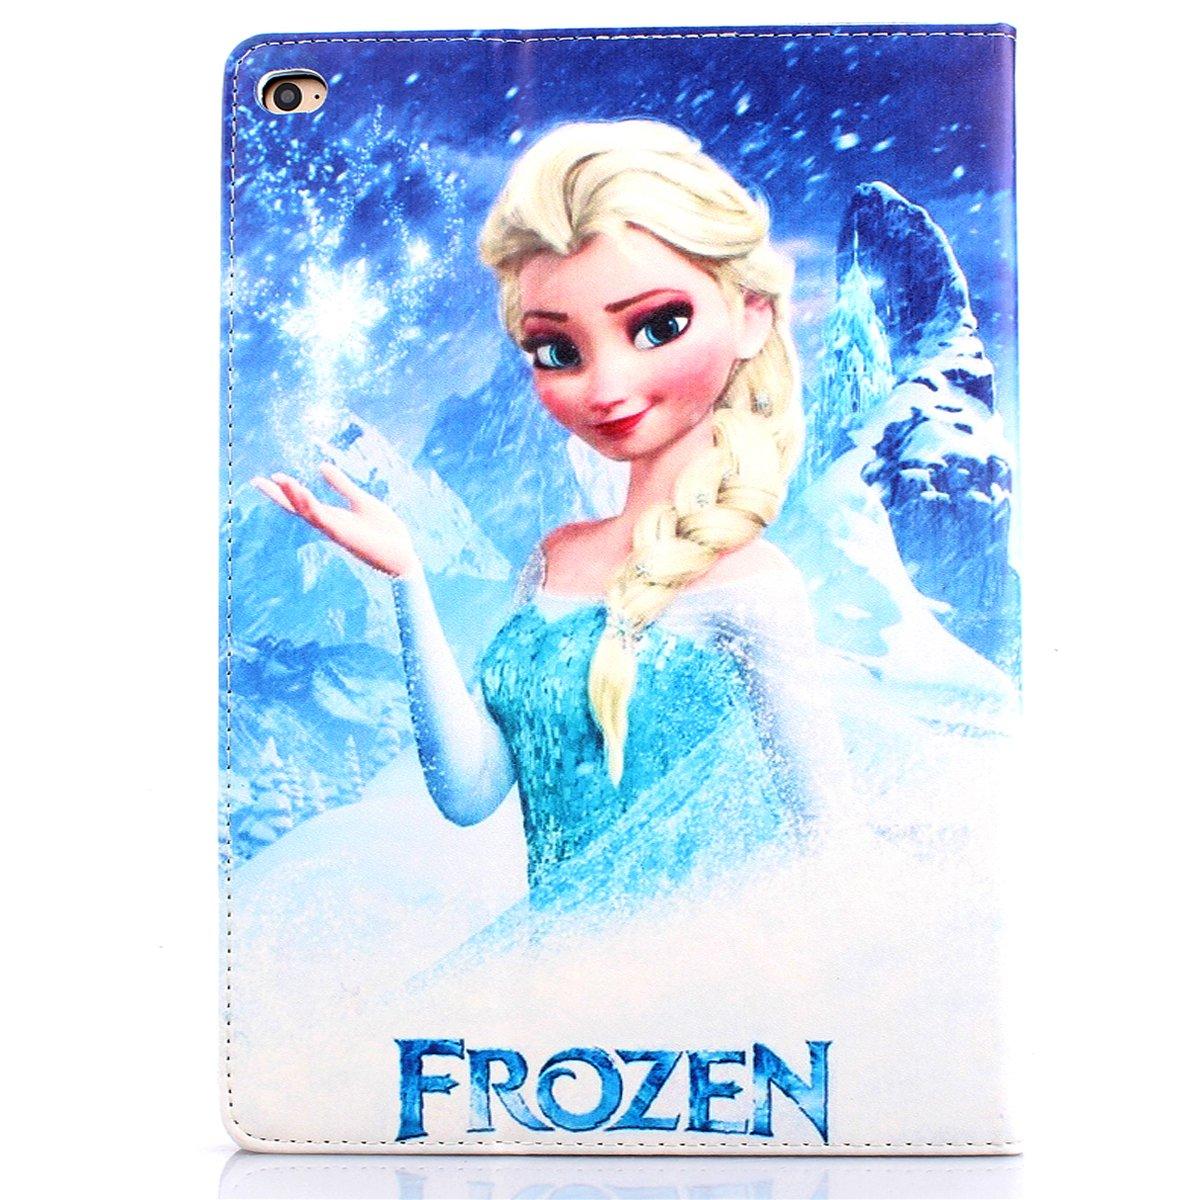 Amazon.com: iPad Air 2 Case, hm-ant Smart Anna & Elsa con ...